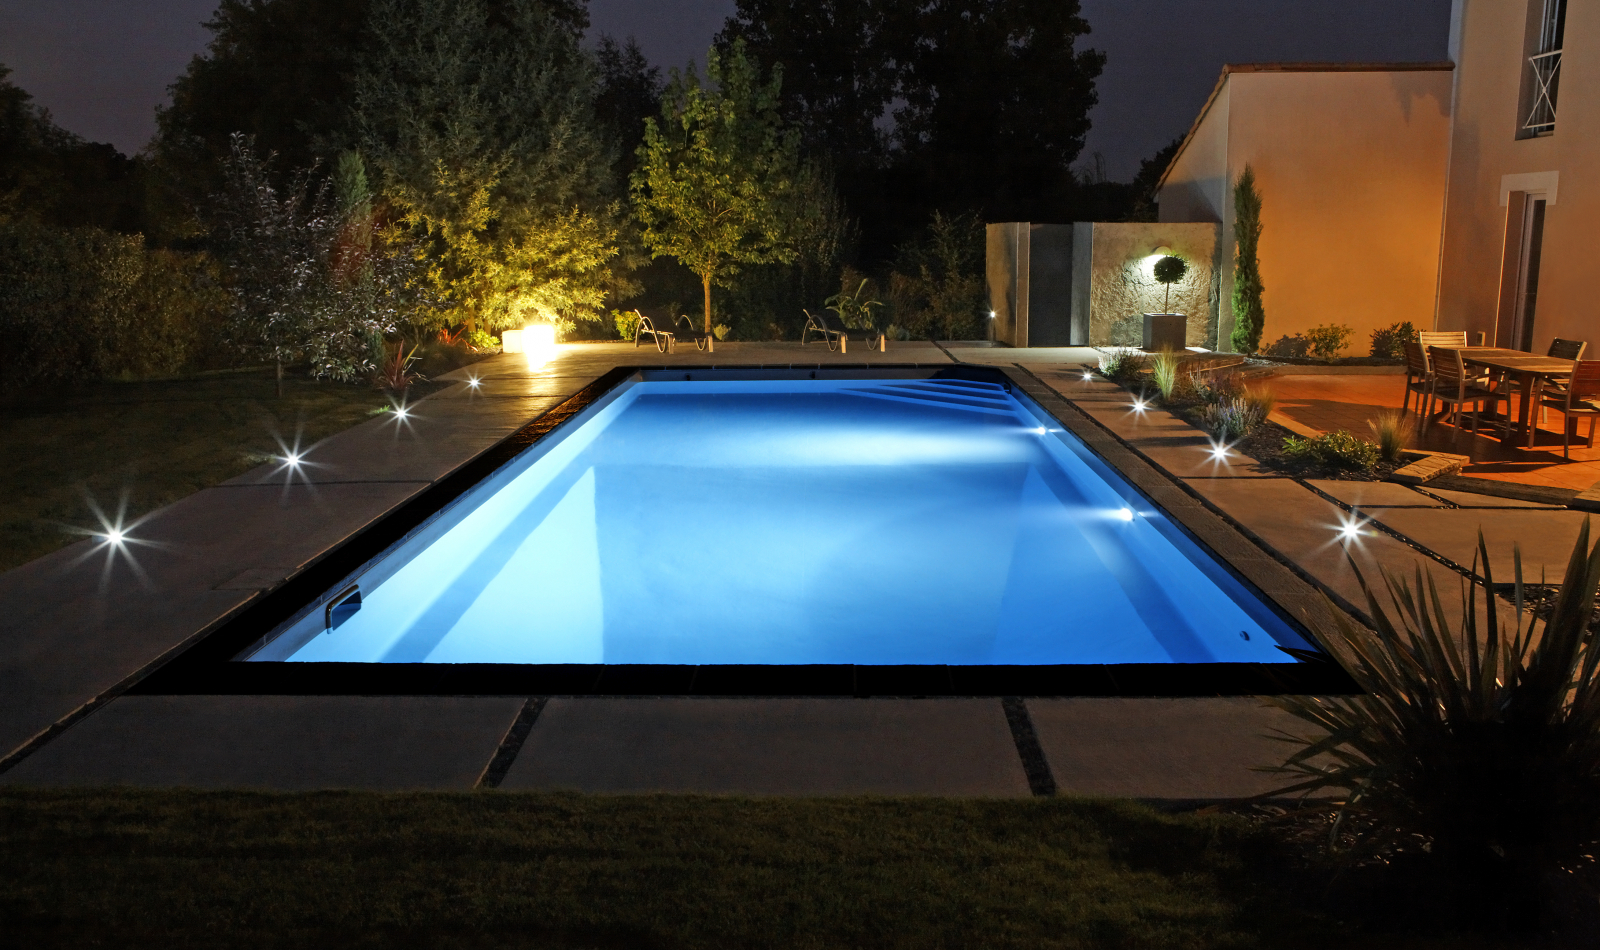 Idee Eclairage Terrasse Piscine eclairage terrasse piscine amenagement piscine eclairage